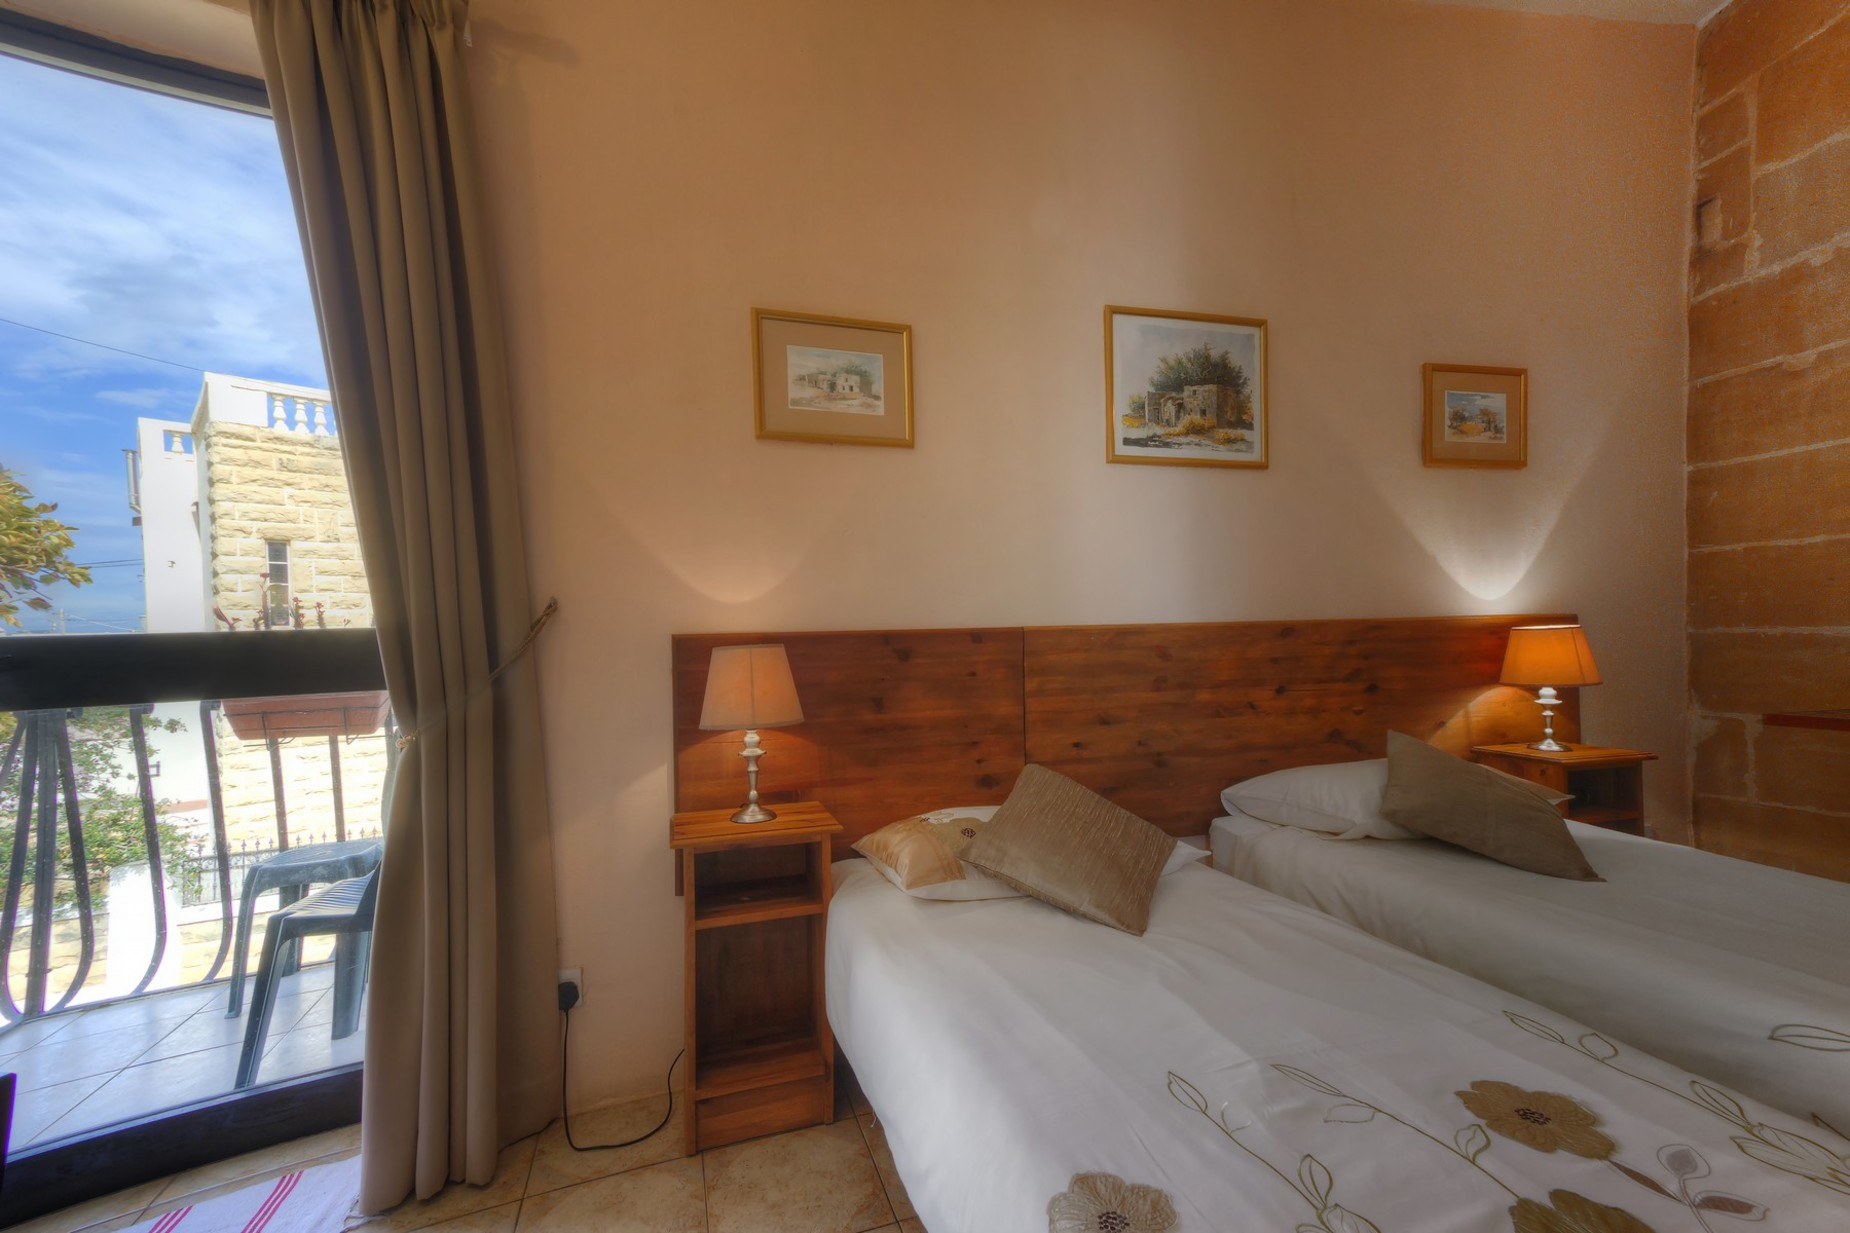 0 bed Hotel For Rent in Swieqi, Swieqi - thumb 6